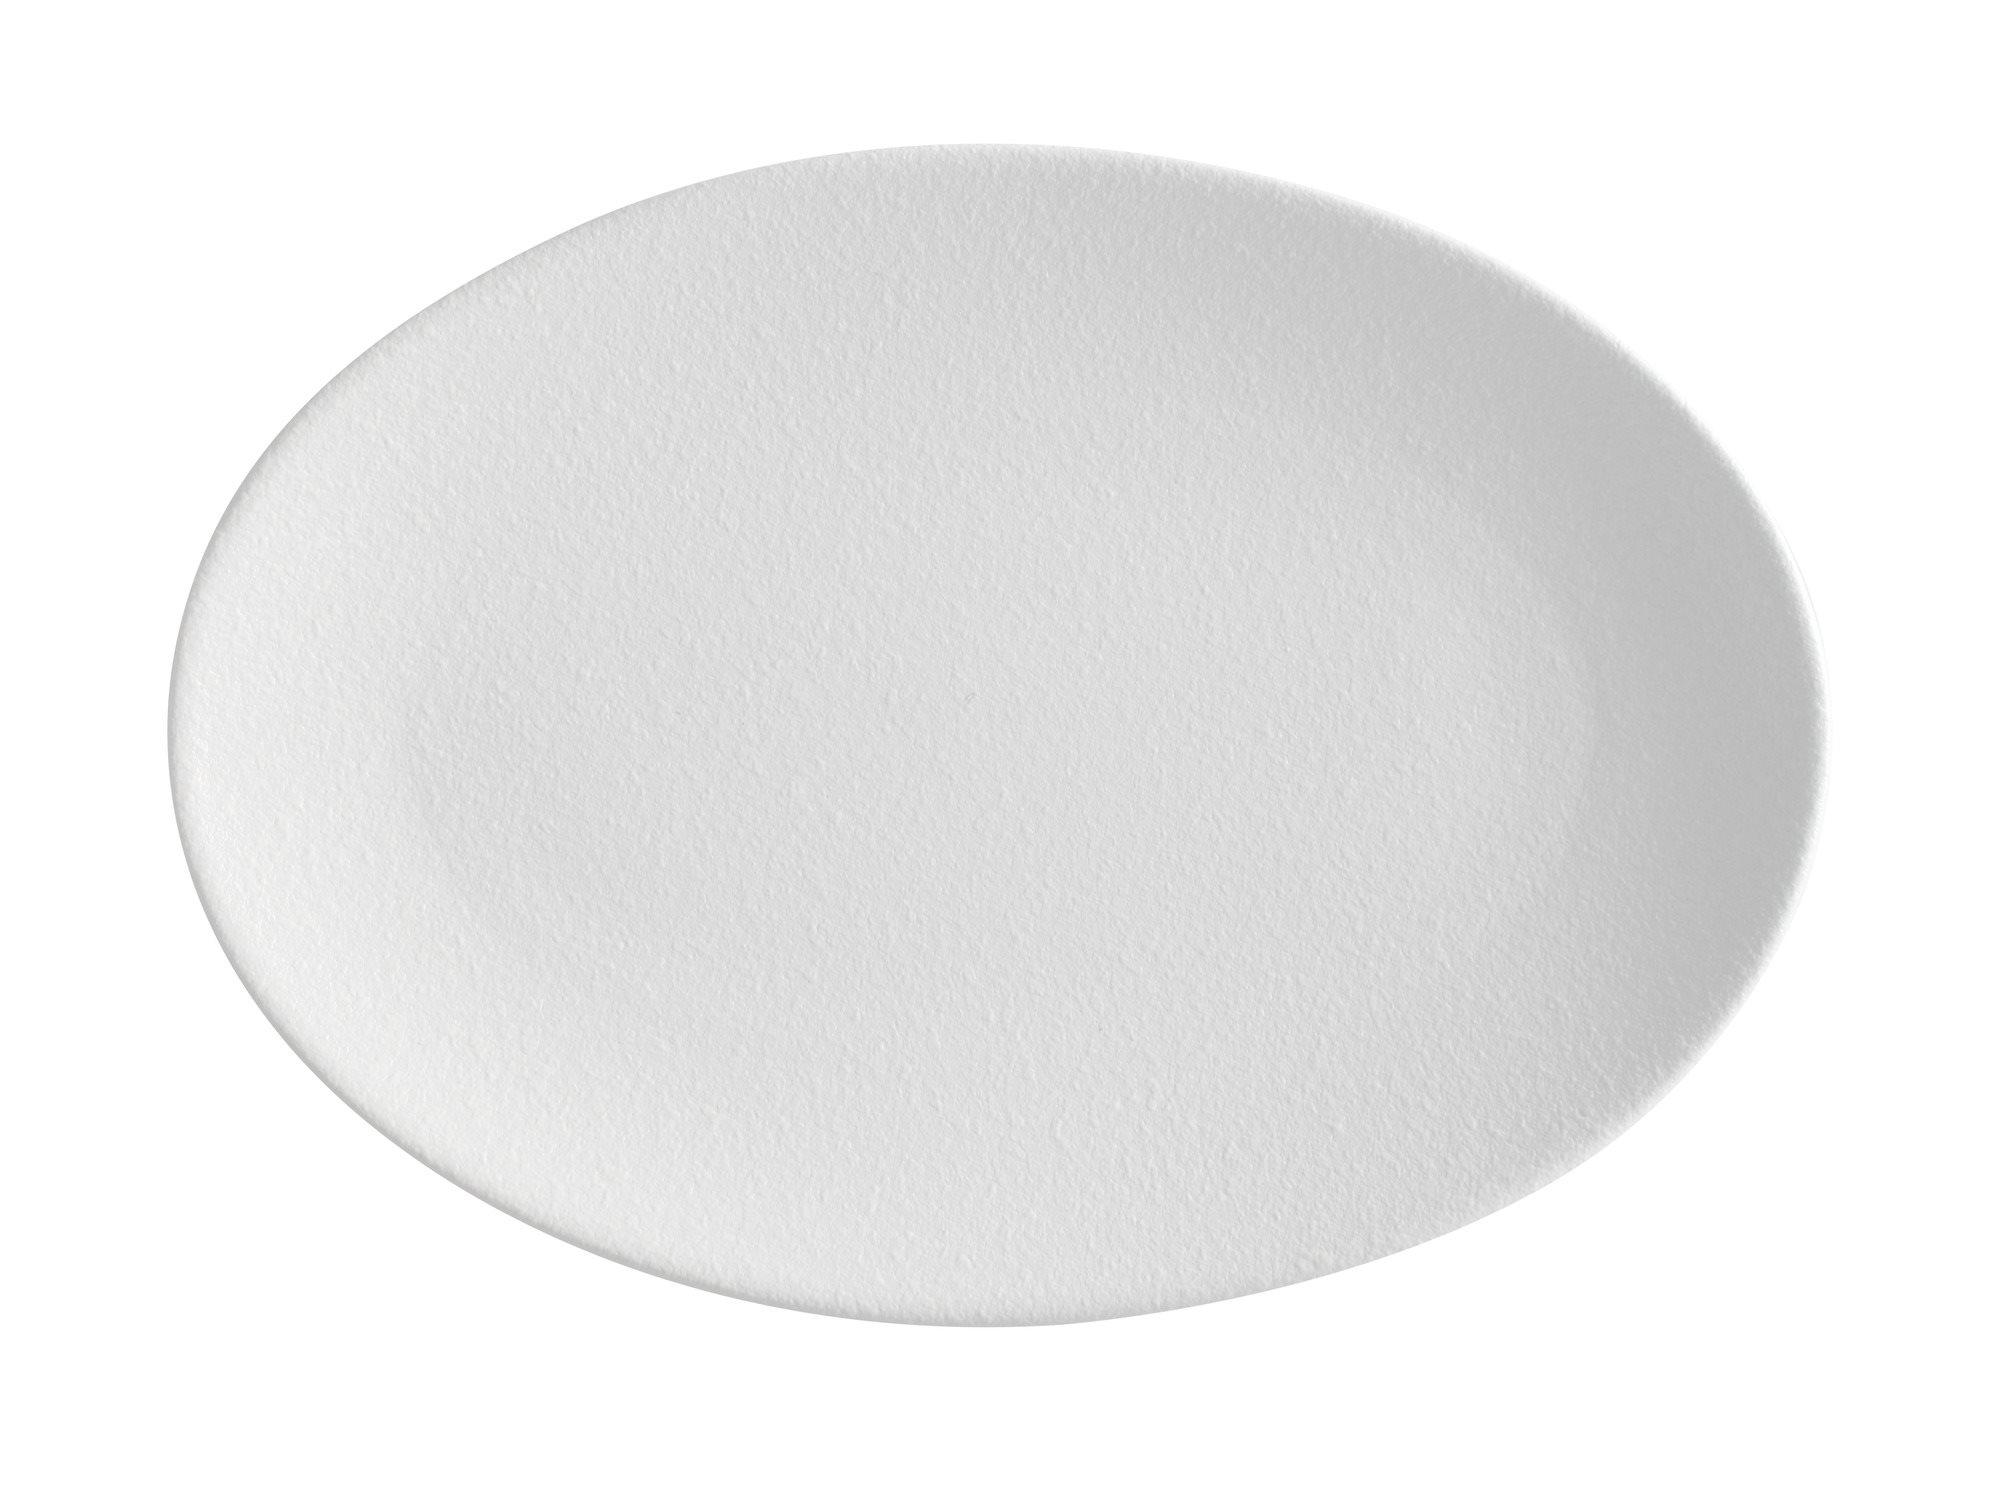 Maxwell & Williams Πιατέλα Οβάλ Λευκή Caviar 35x25cm